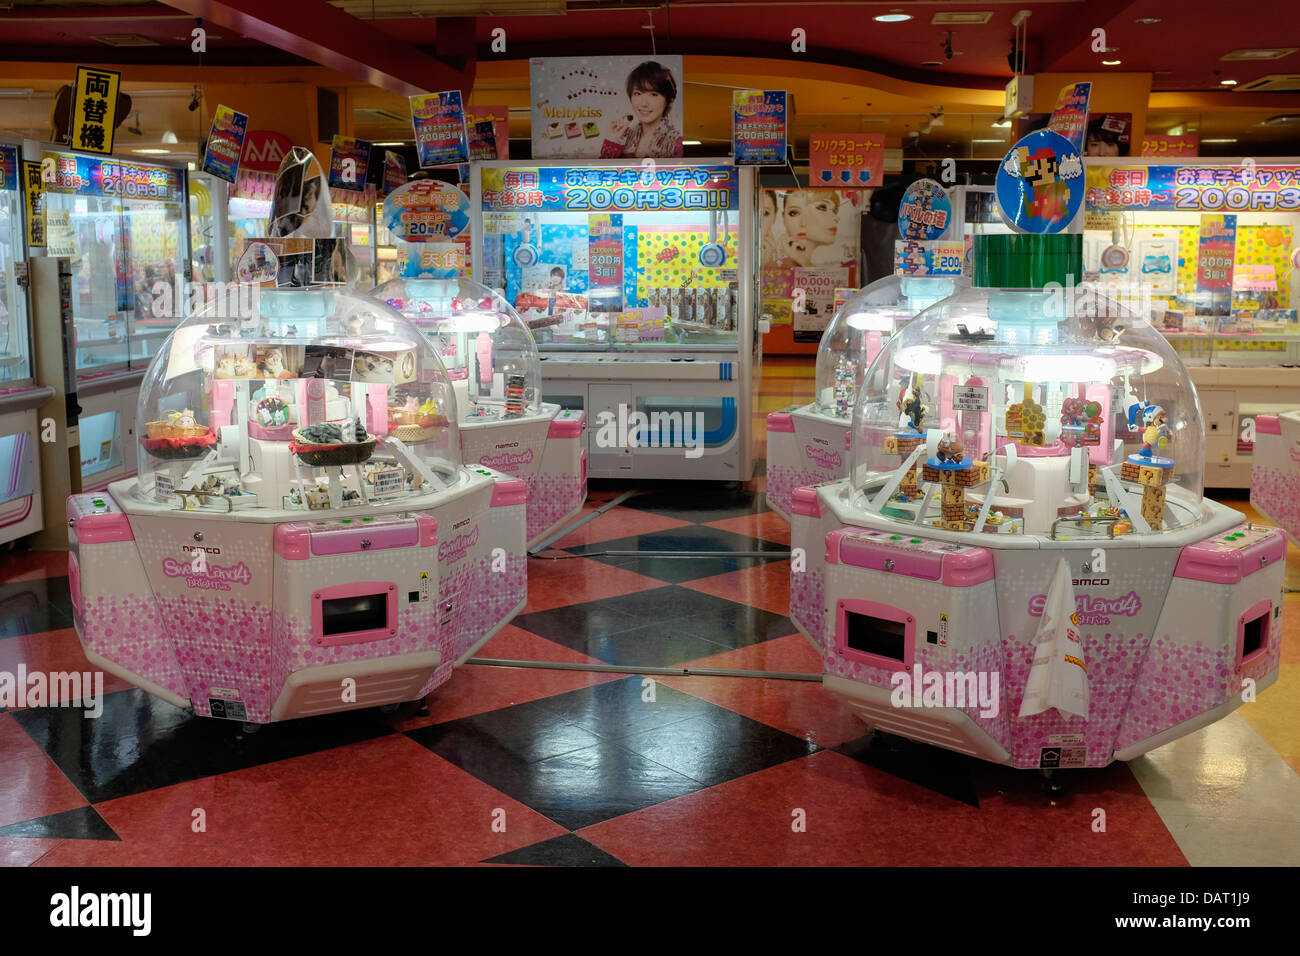 A Claw Crane Game Arcade in Dotonburi, Osaka, Japan - Stock Image